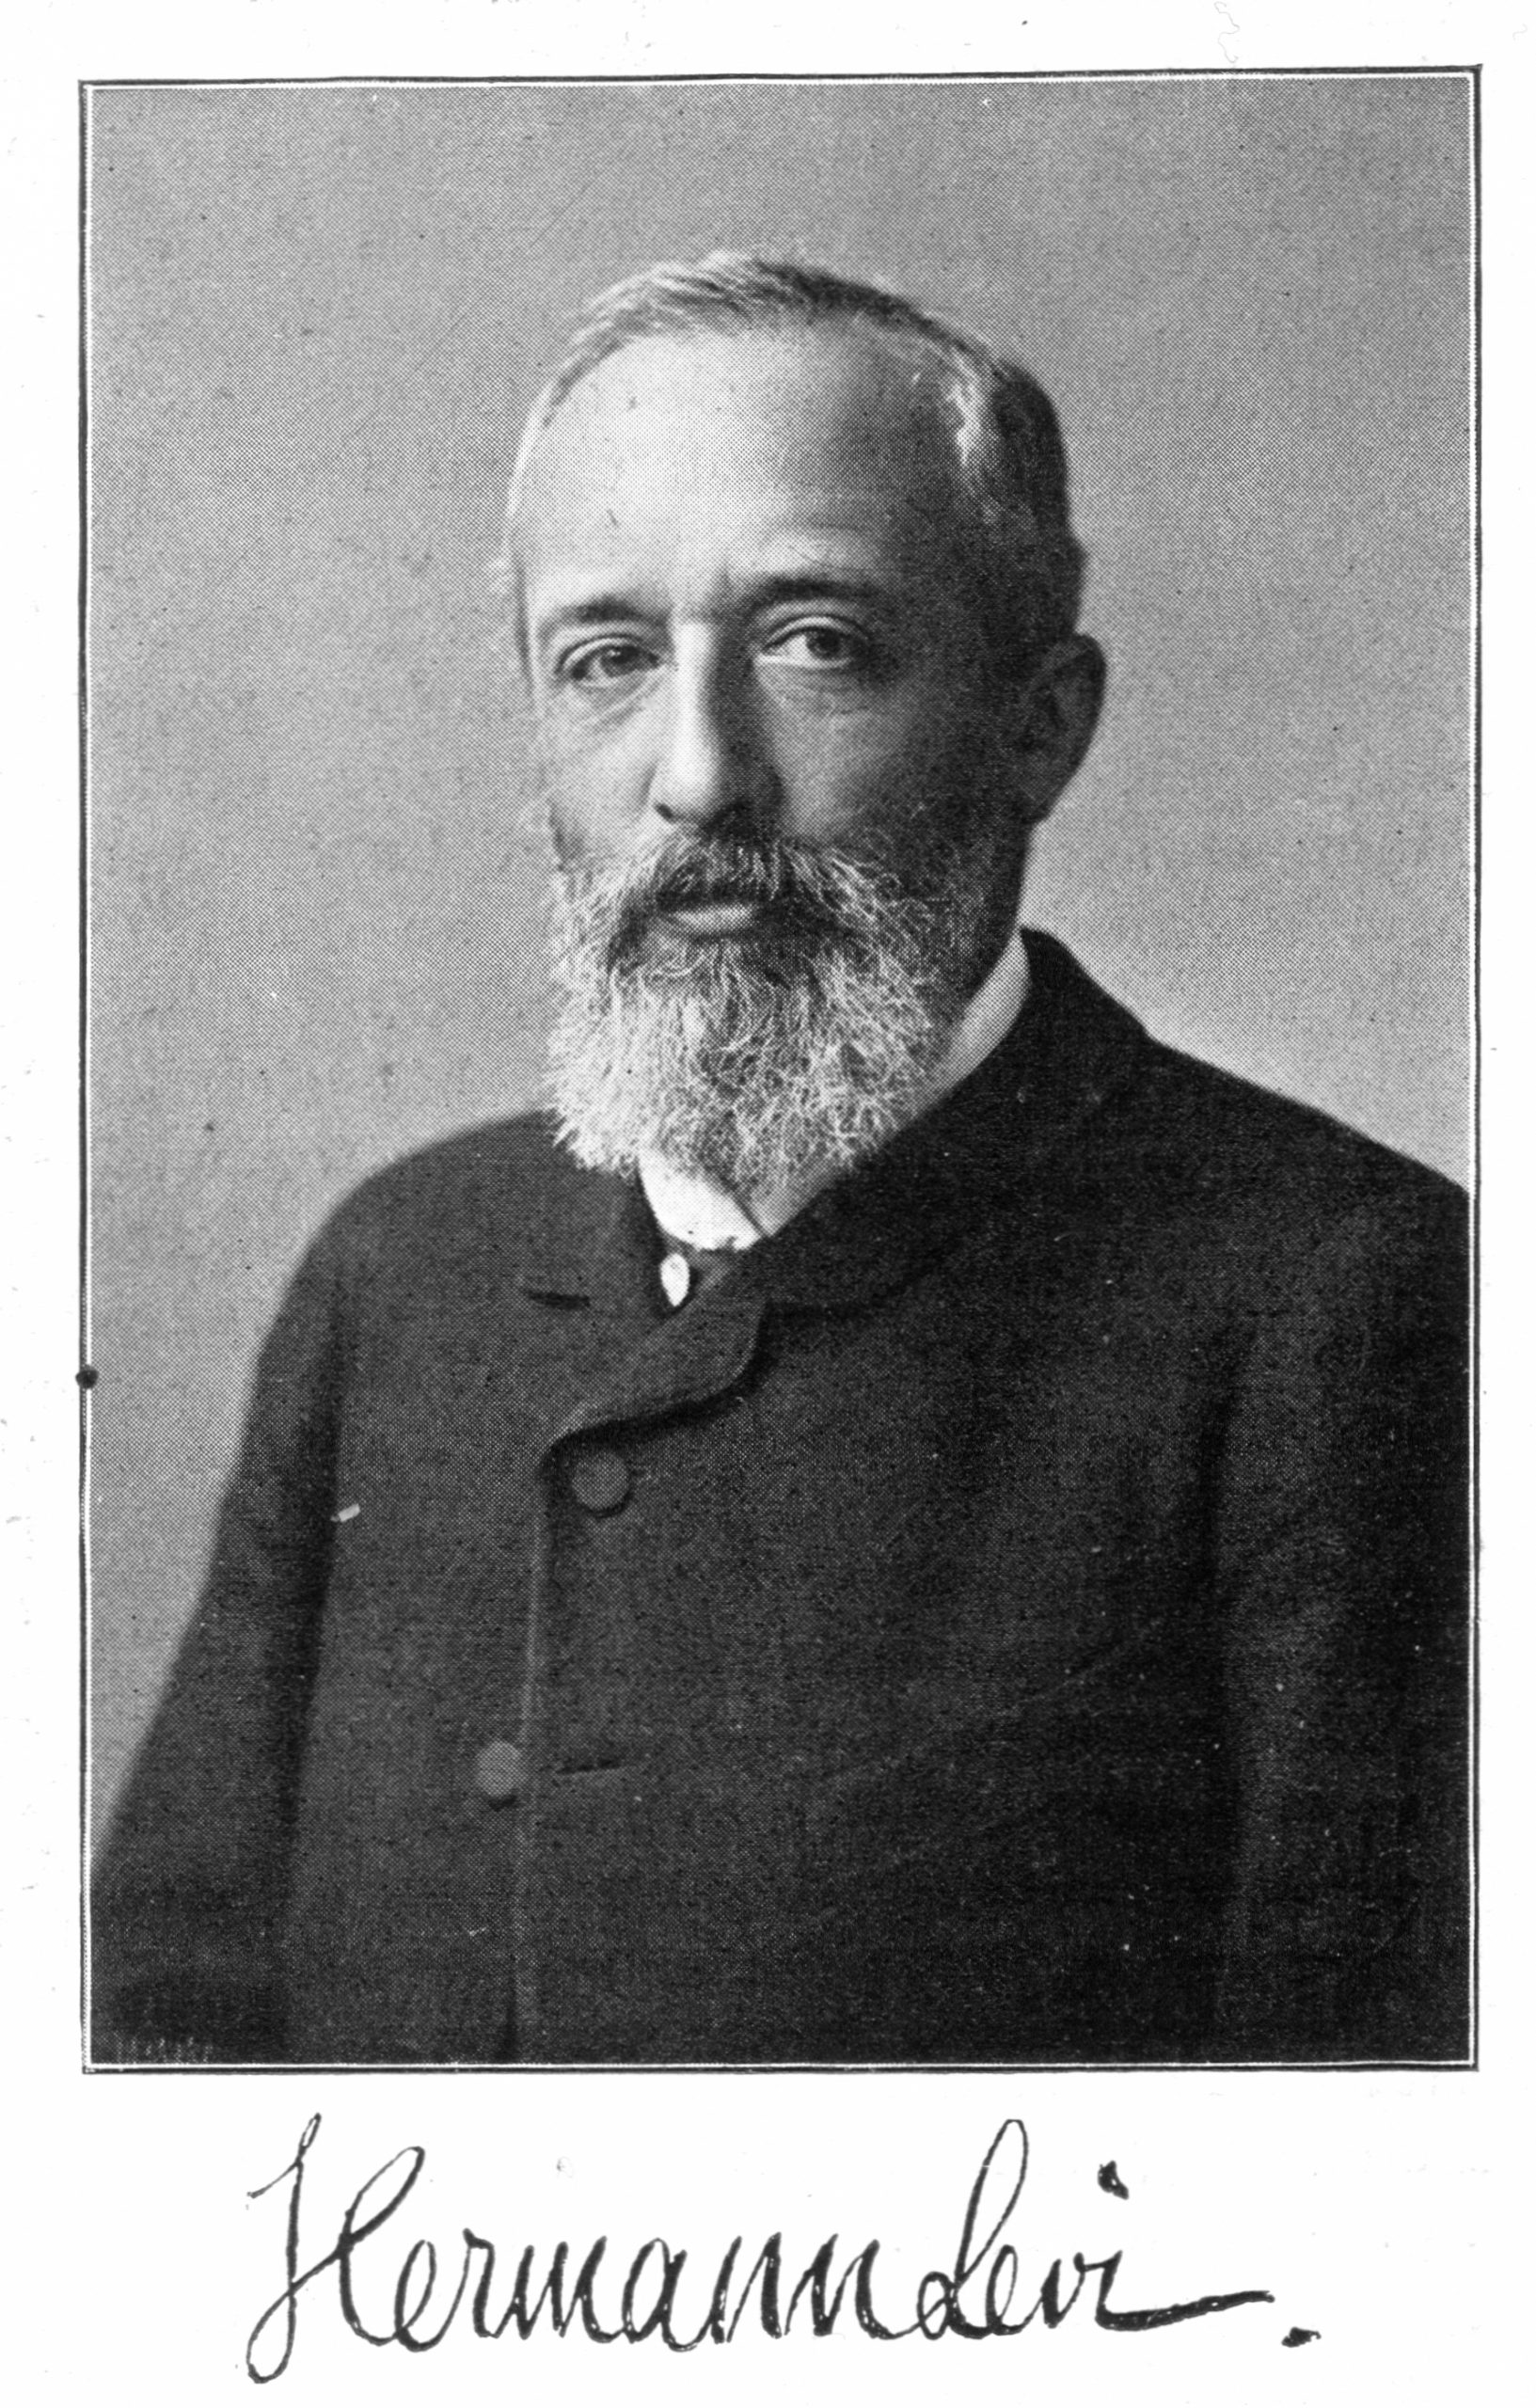 Hermann Levi